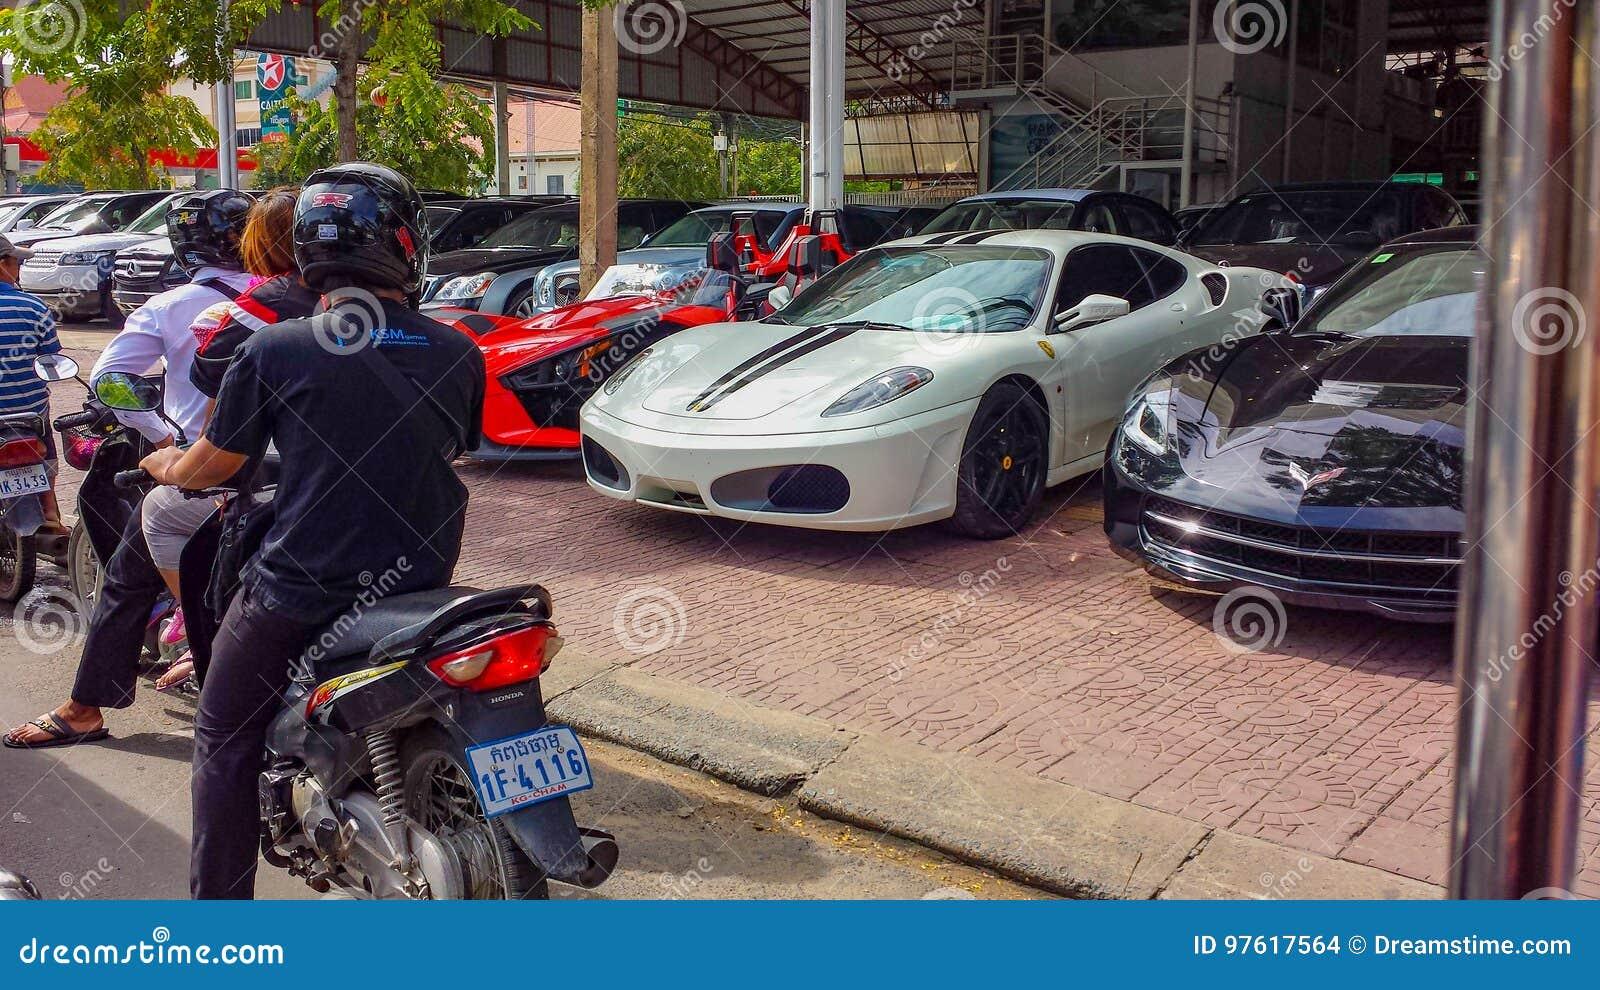 Car dealership cambodia editorial stock image  Image of khmer - 97617564